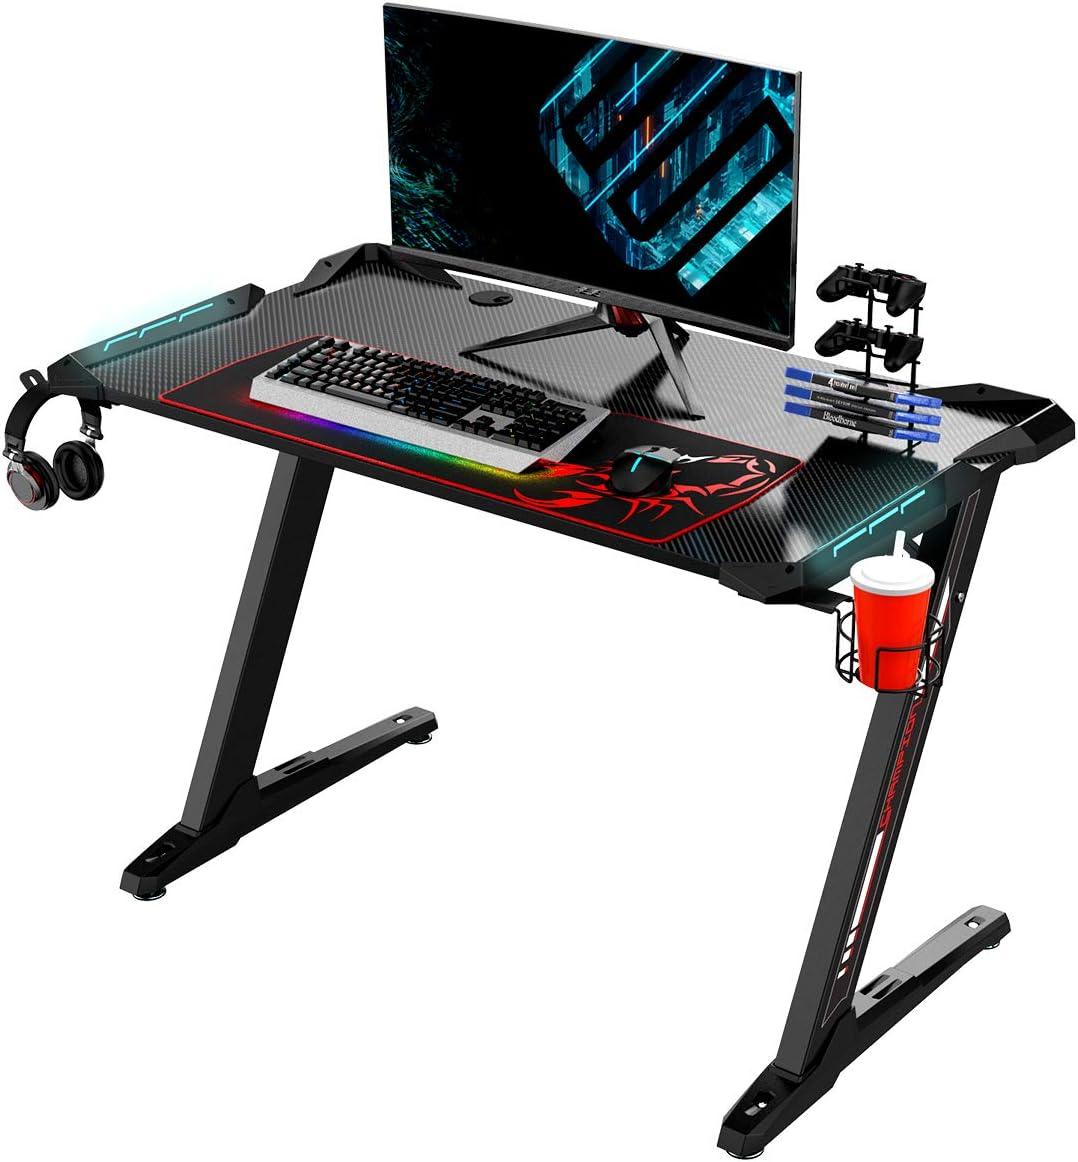 EUREKA ERGONOMIC Z1-S Gaming Desk Mesa de juegos para computadora mesa de juegos mesa de juegos para PC con luces LED fibra de carbono portavasos y gancho para auriculares Negro: Amazon.es: Juguetes